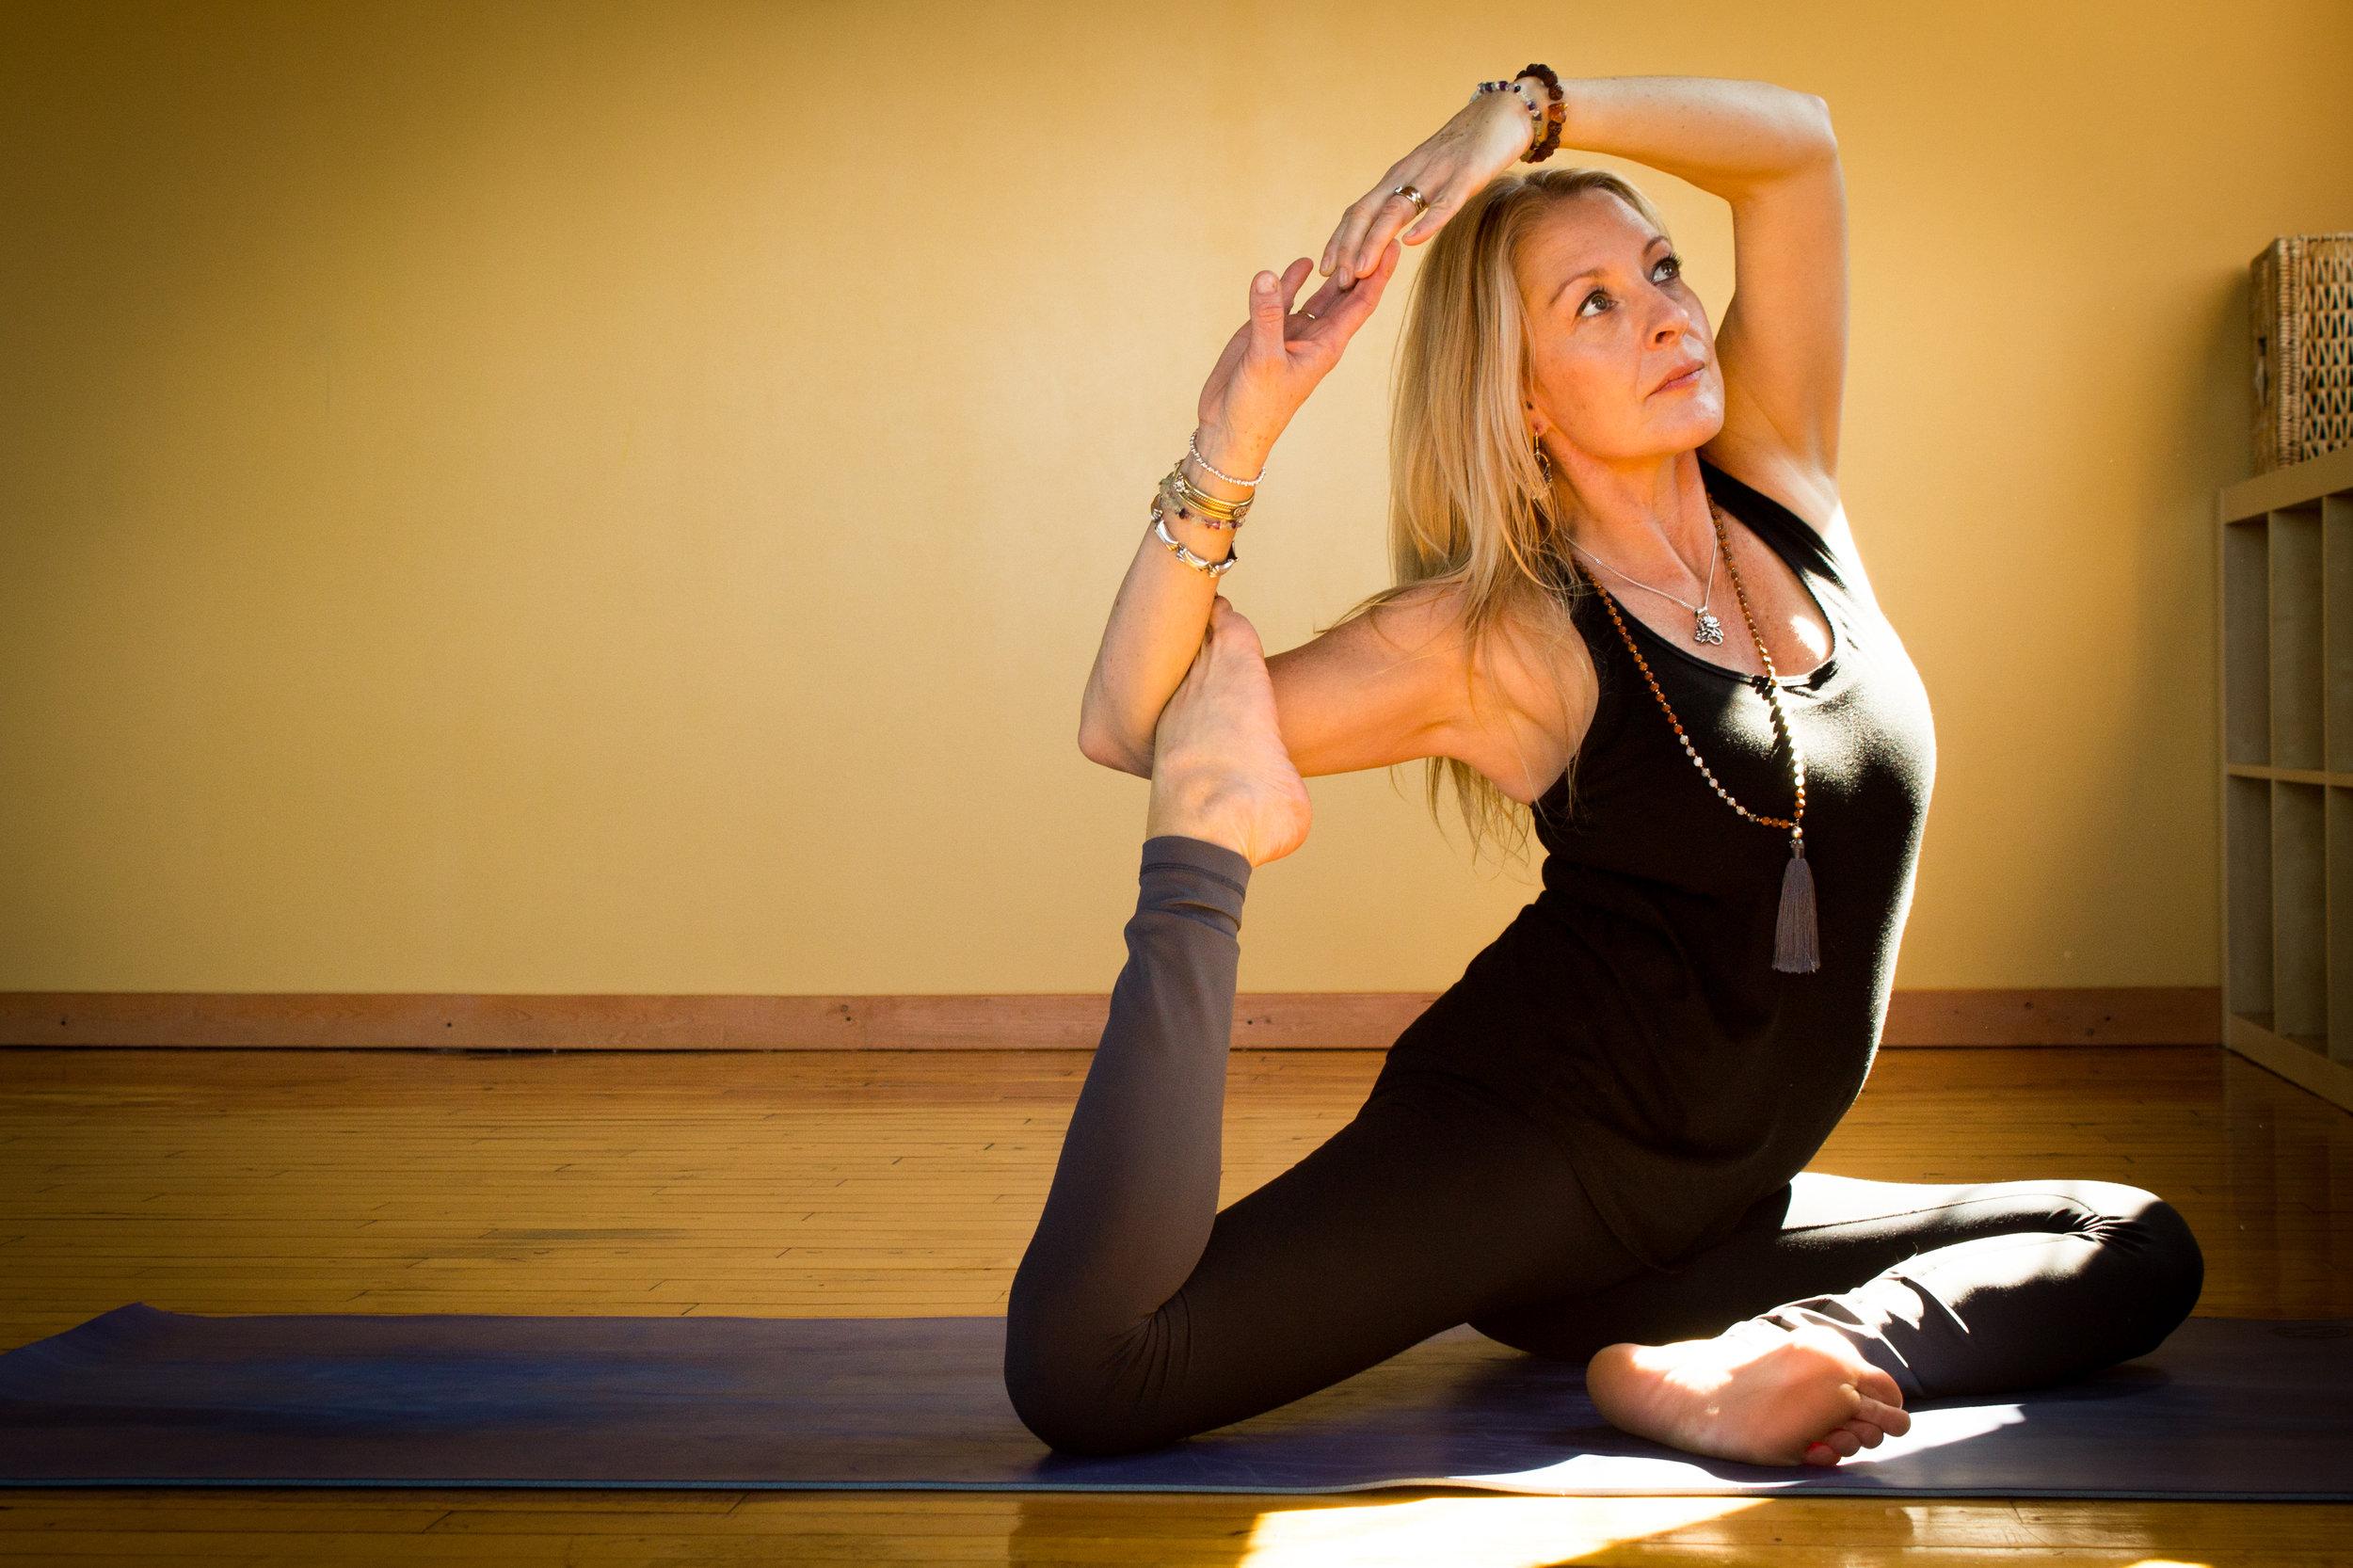 Yoga-photography-asana-toronto.jpg